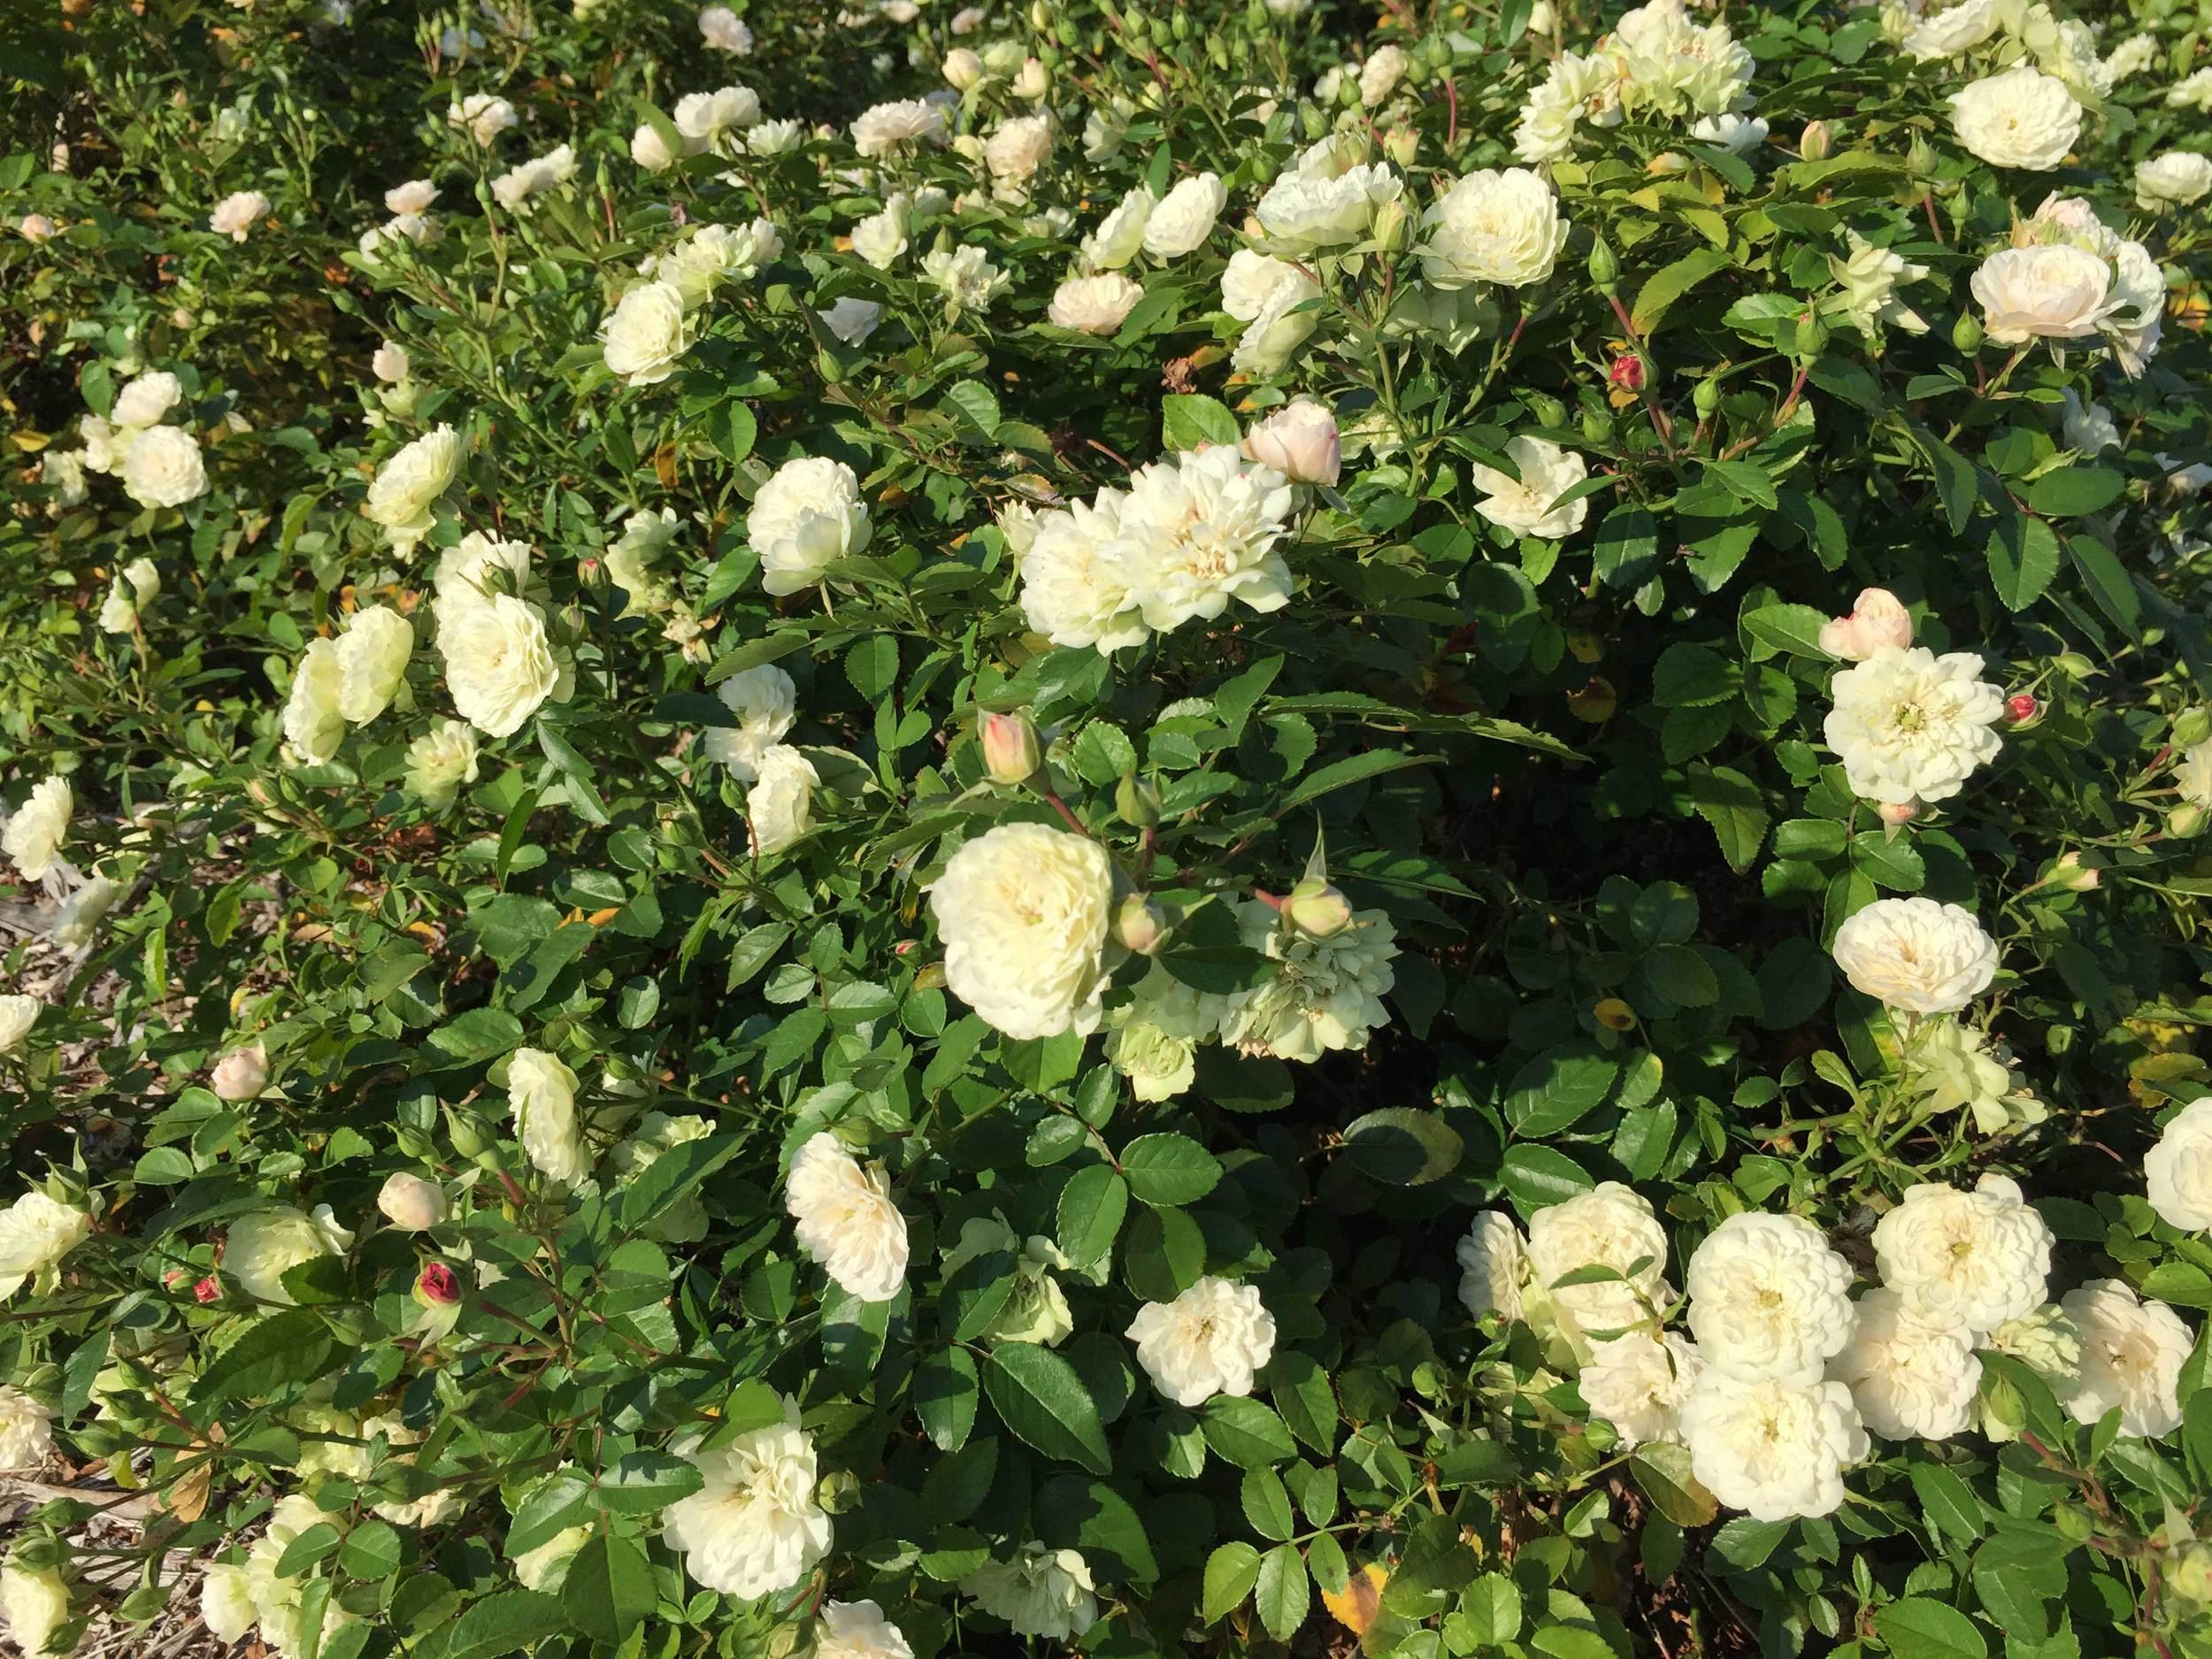 Drift Rose 'Popcorn' (Rosa 'novarospop')  - A low growing shrub with summer blooms.